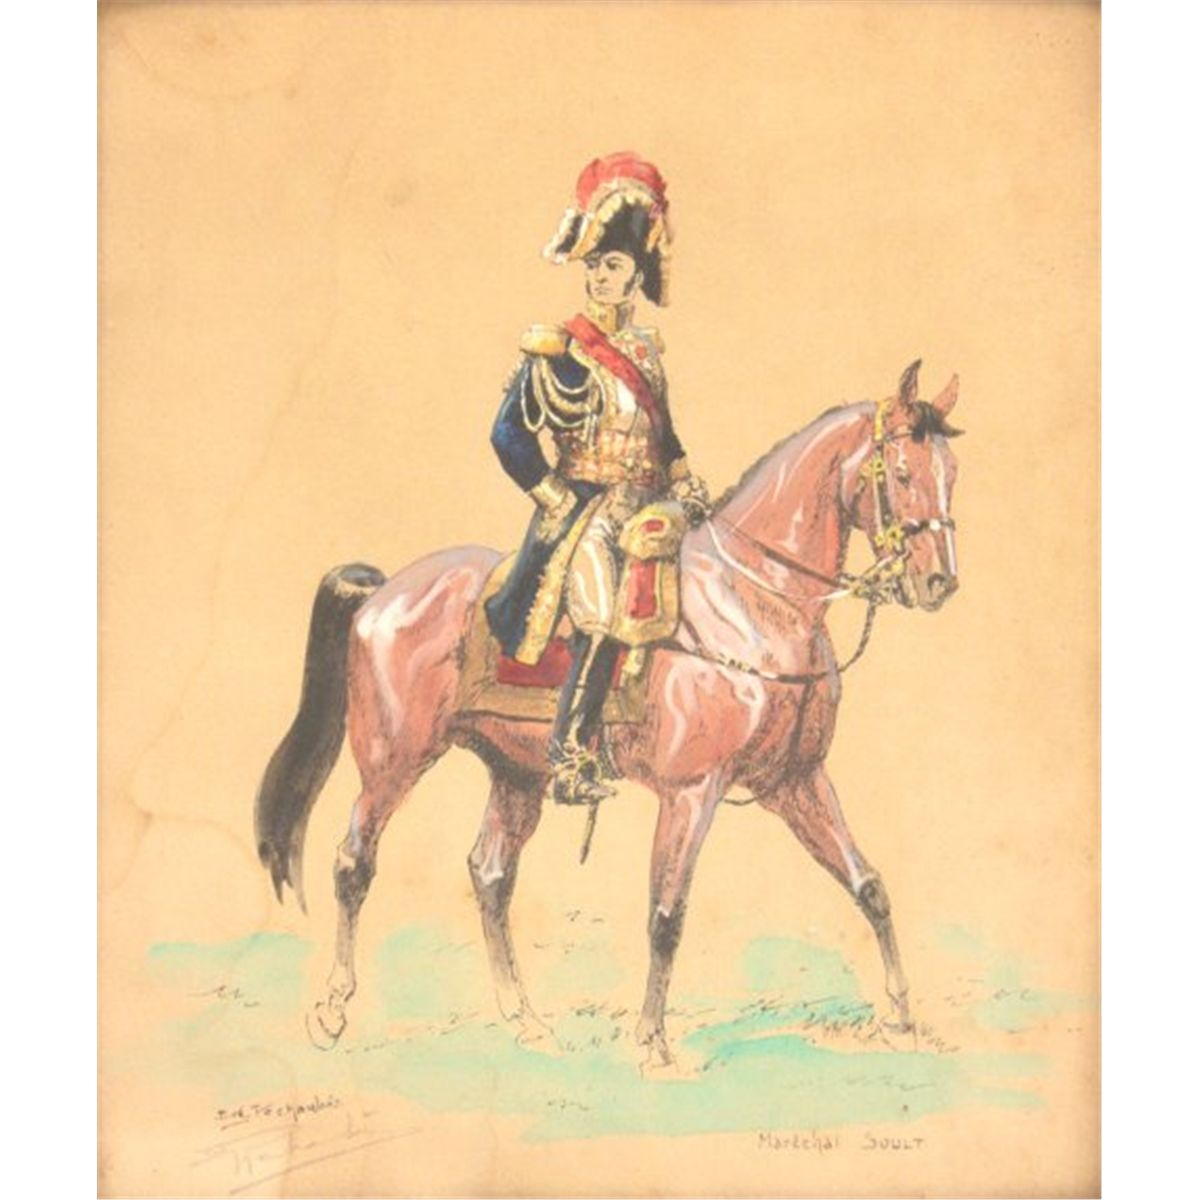 1200x1200 Eugene Pechaubes Soldier Watercolor